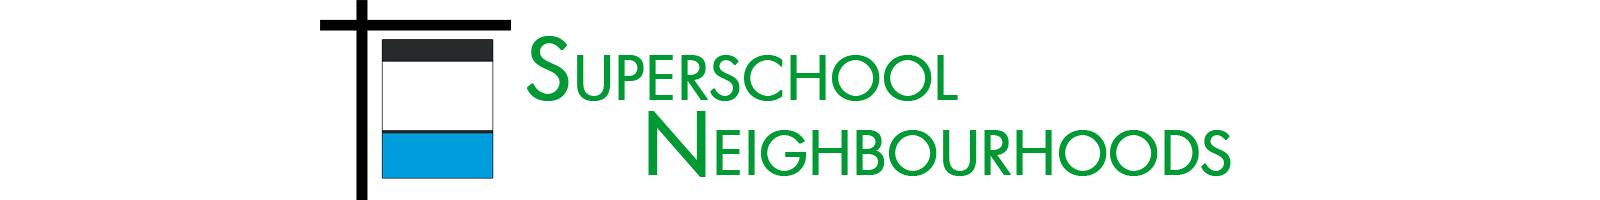 Superschool Neighbourhood